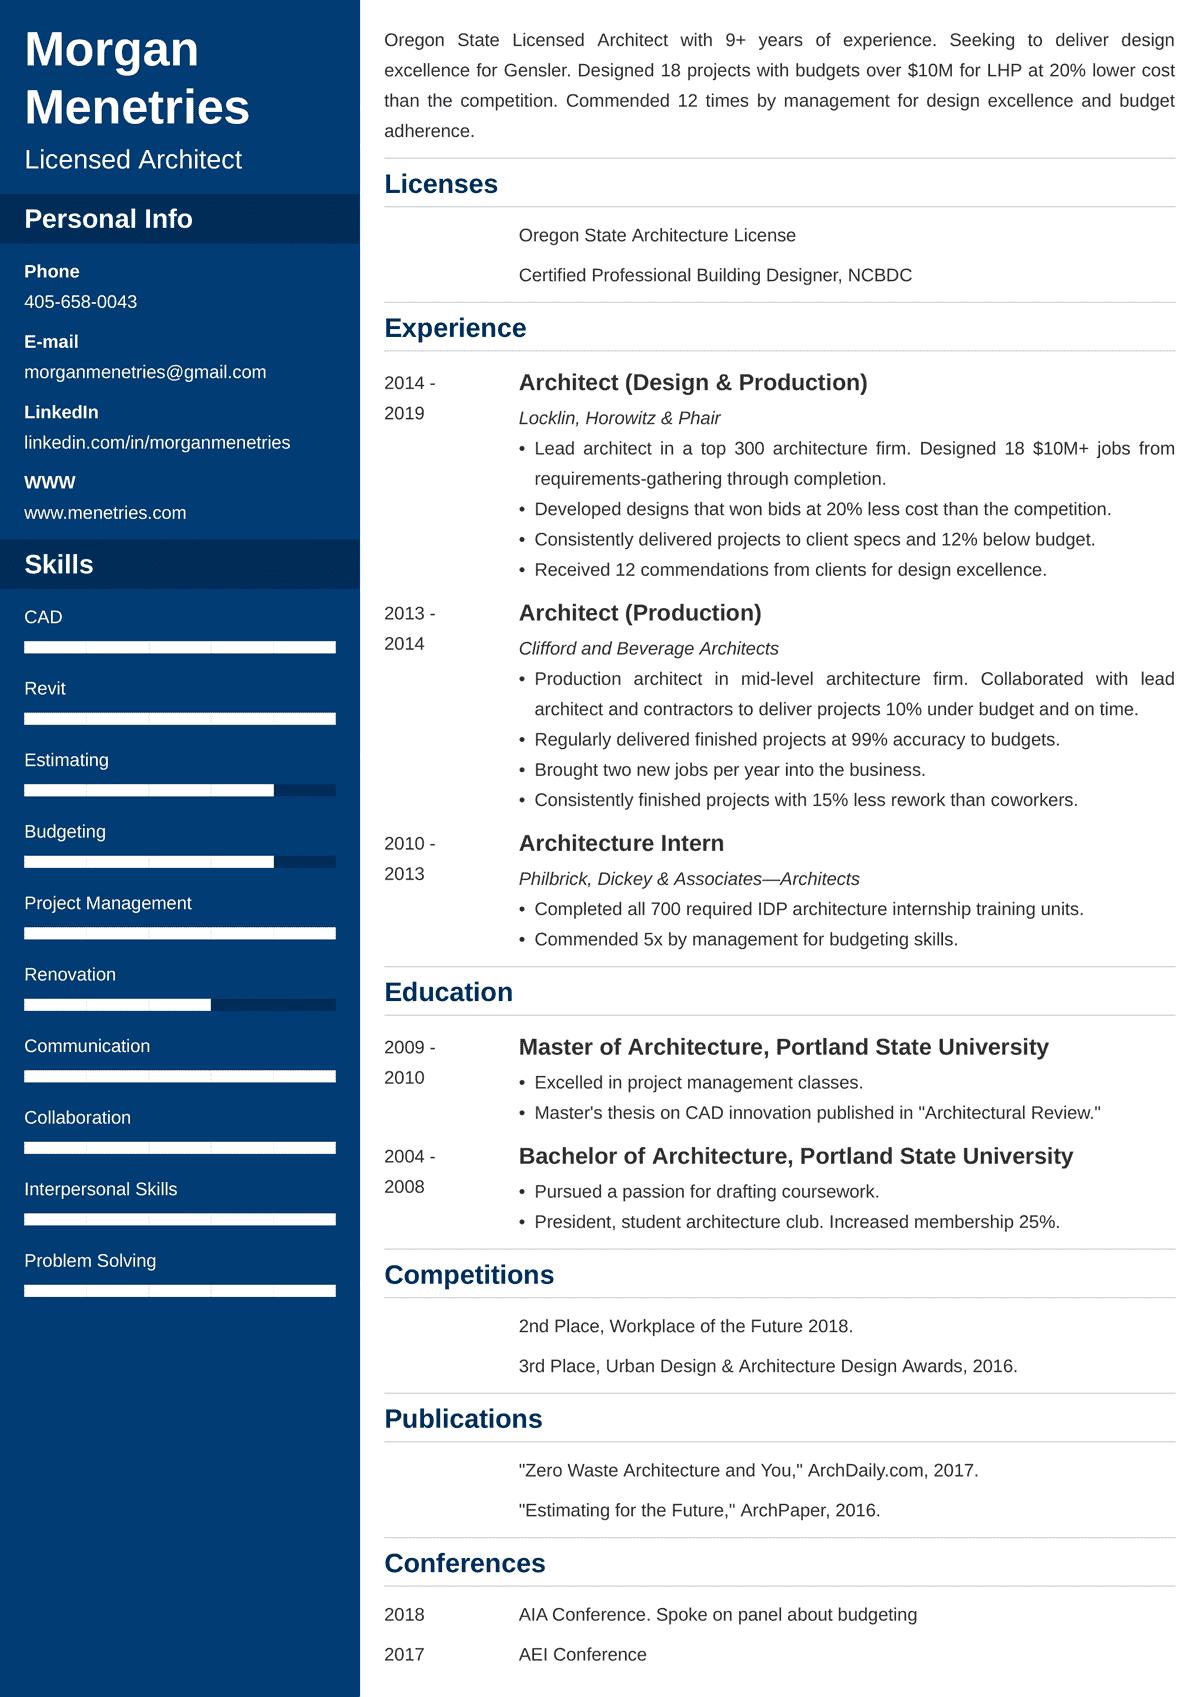 Custom resume writing 101